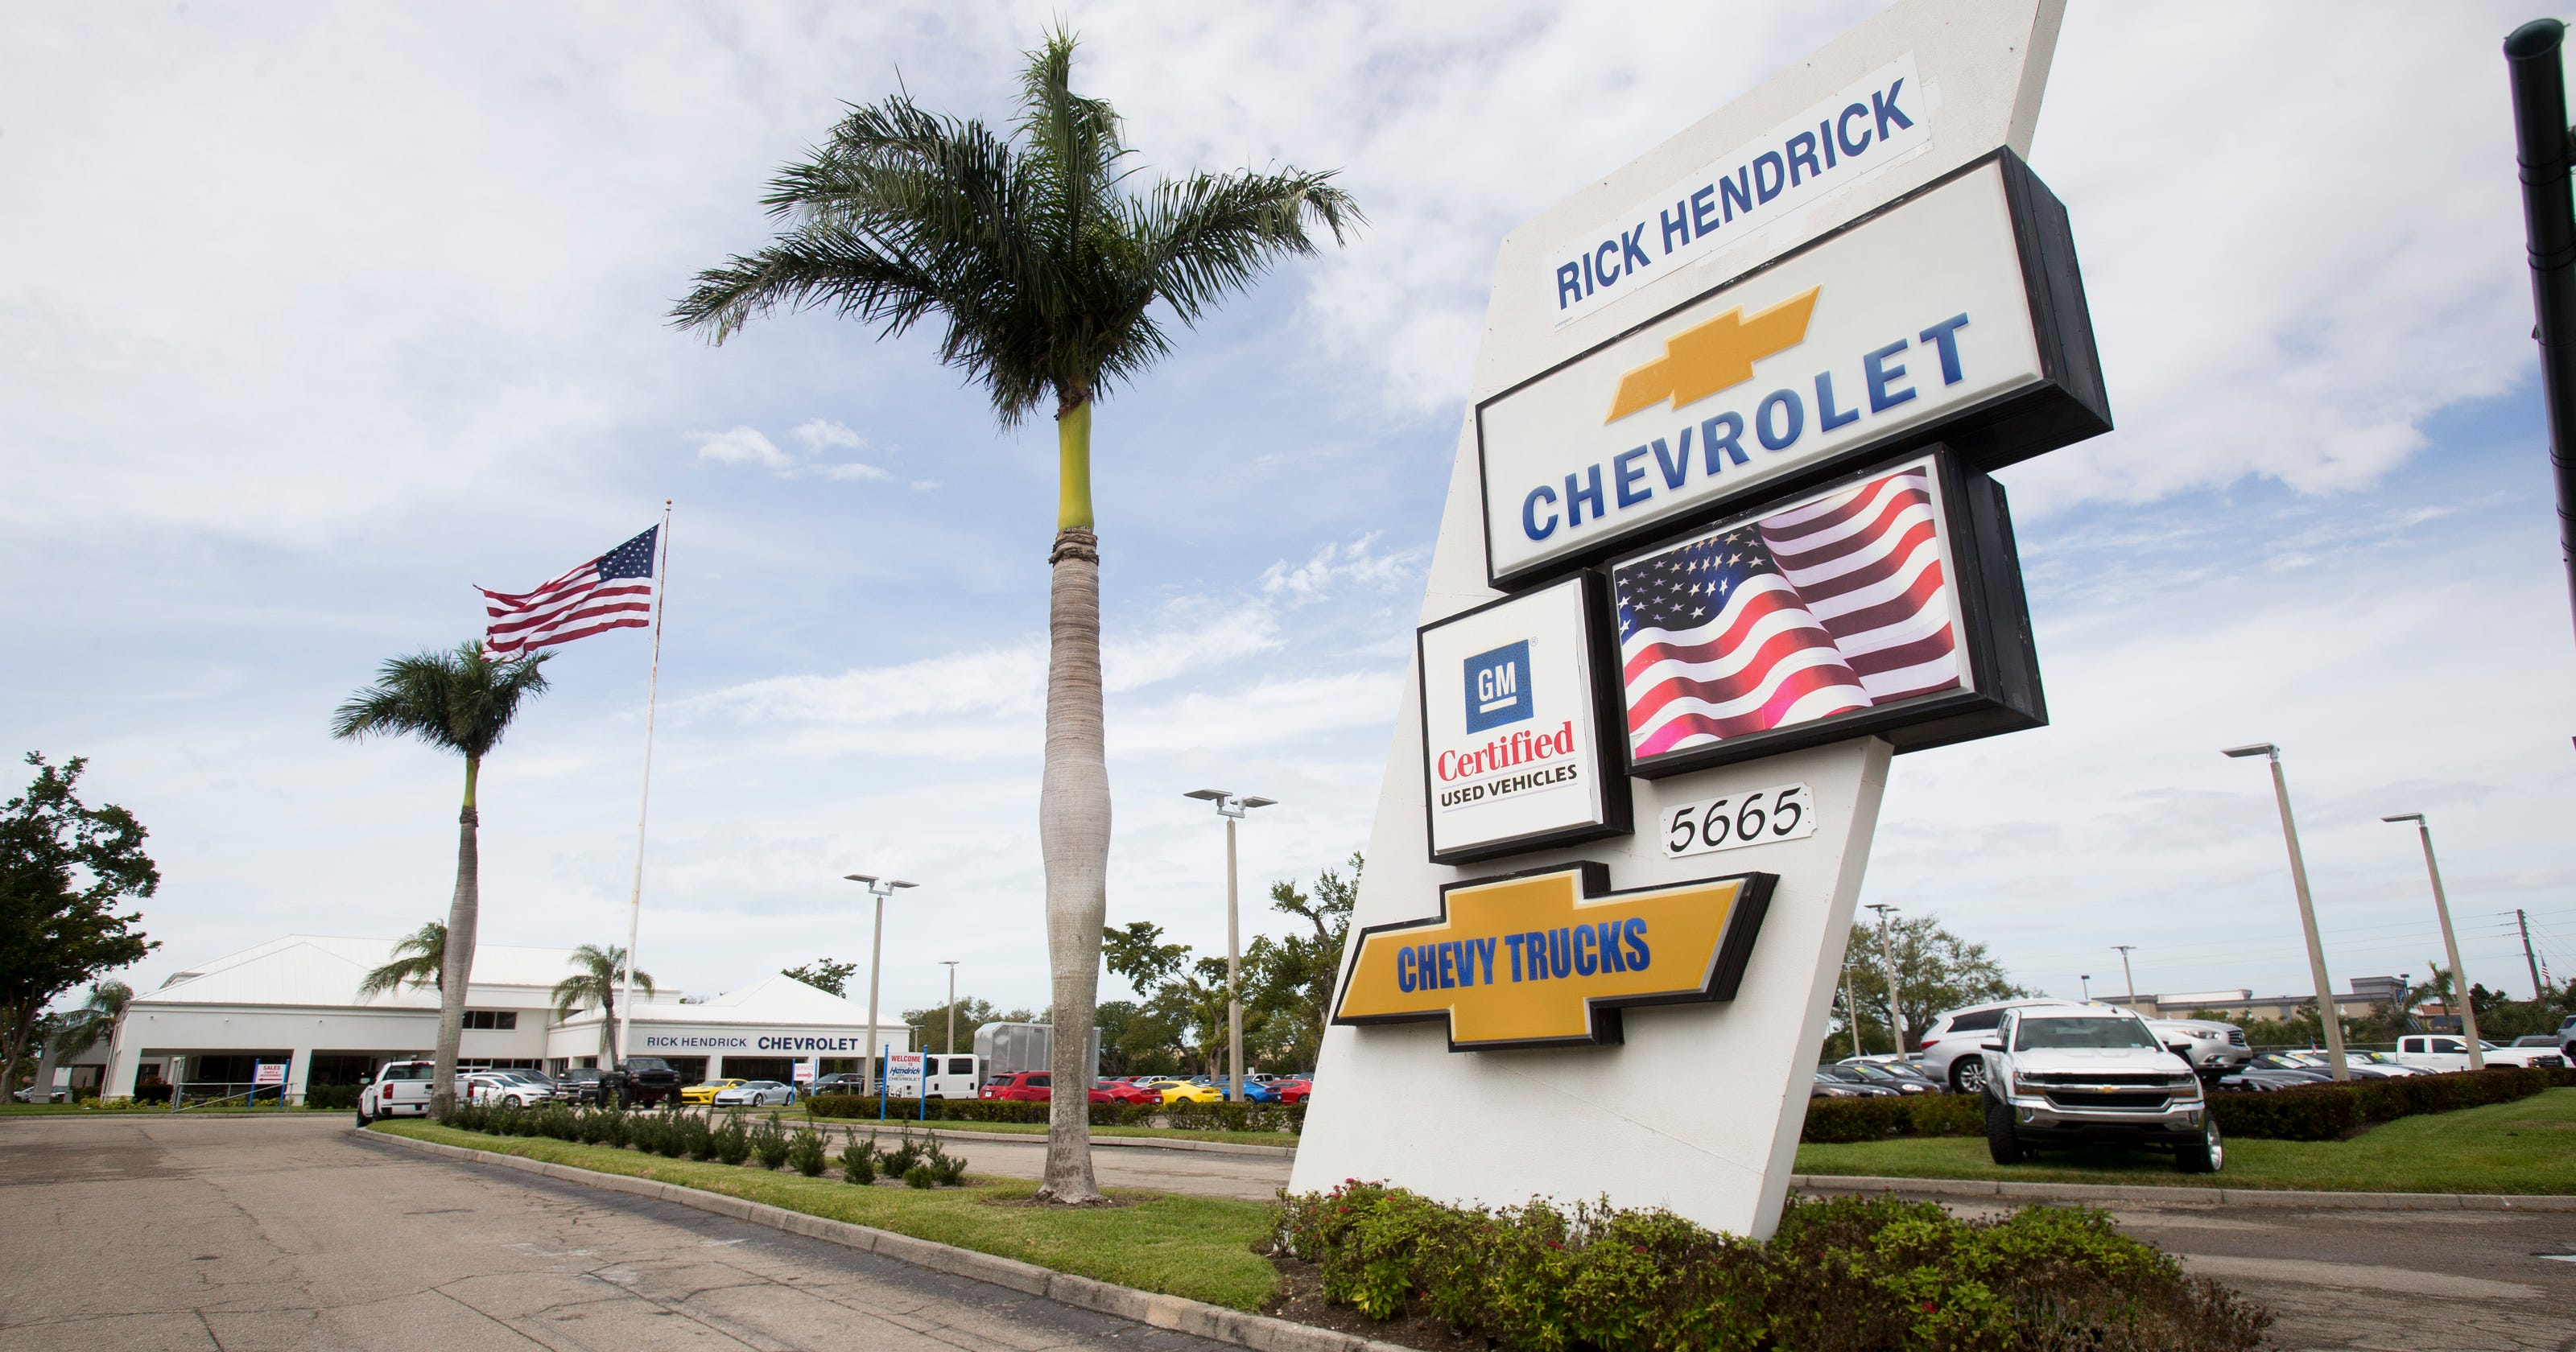 Rick Hendricks Chevrolet >> Ex Sales Associates For Naples Chevy Dealership Sue Over